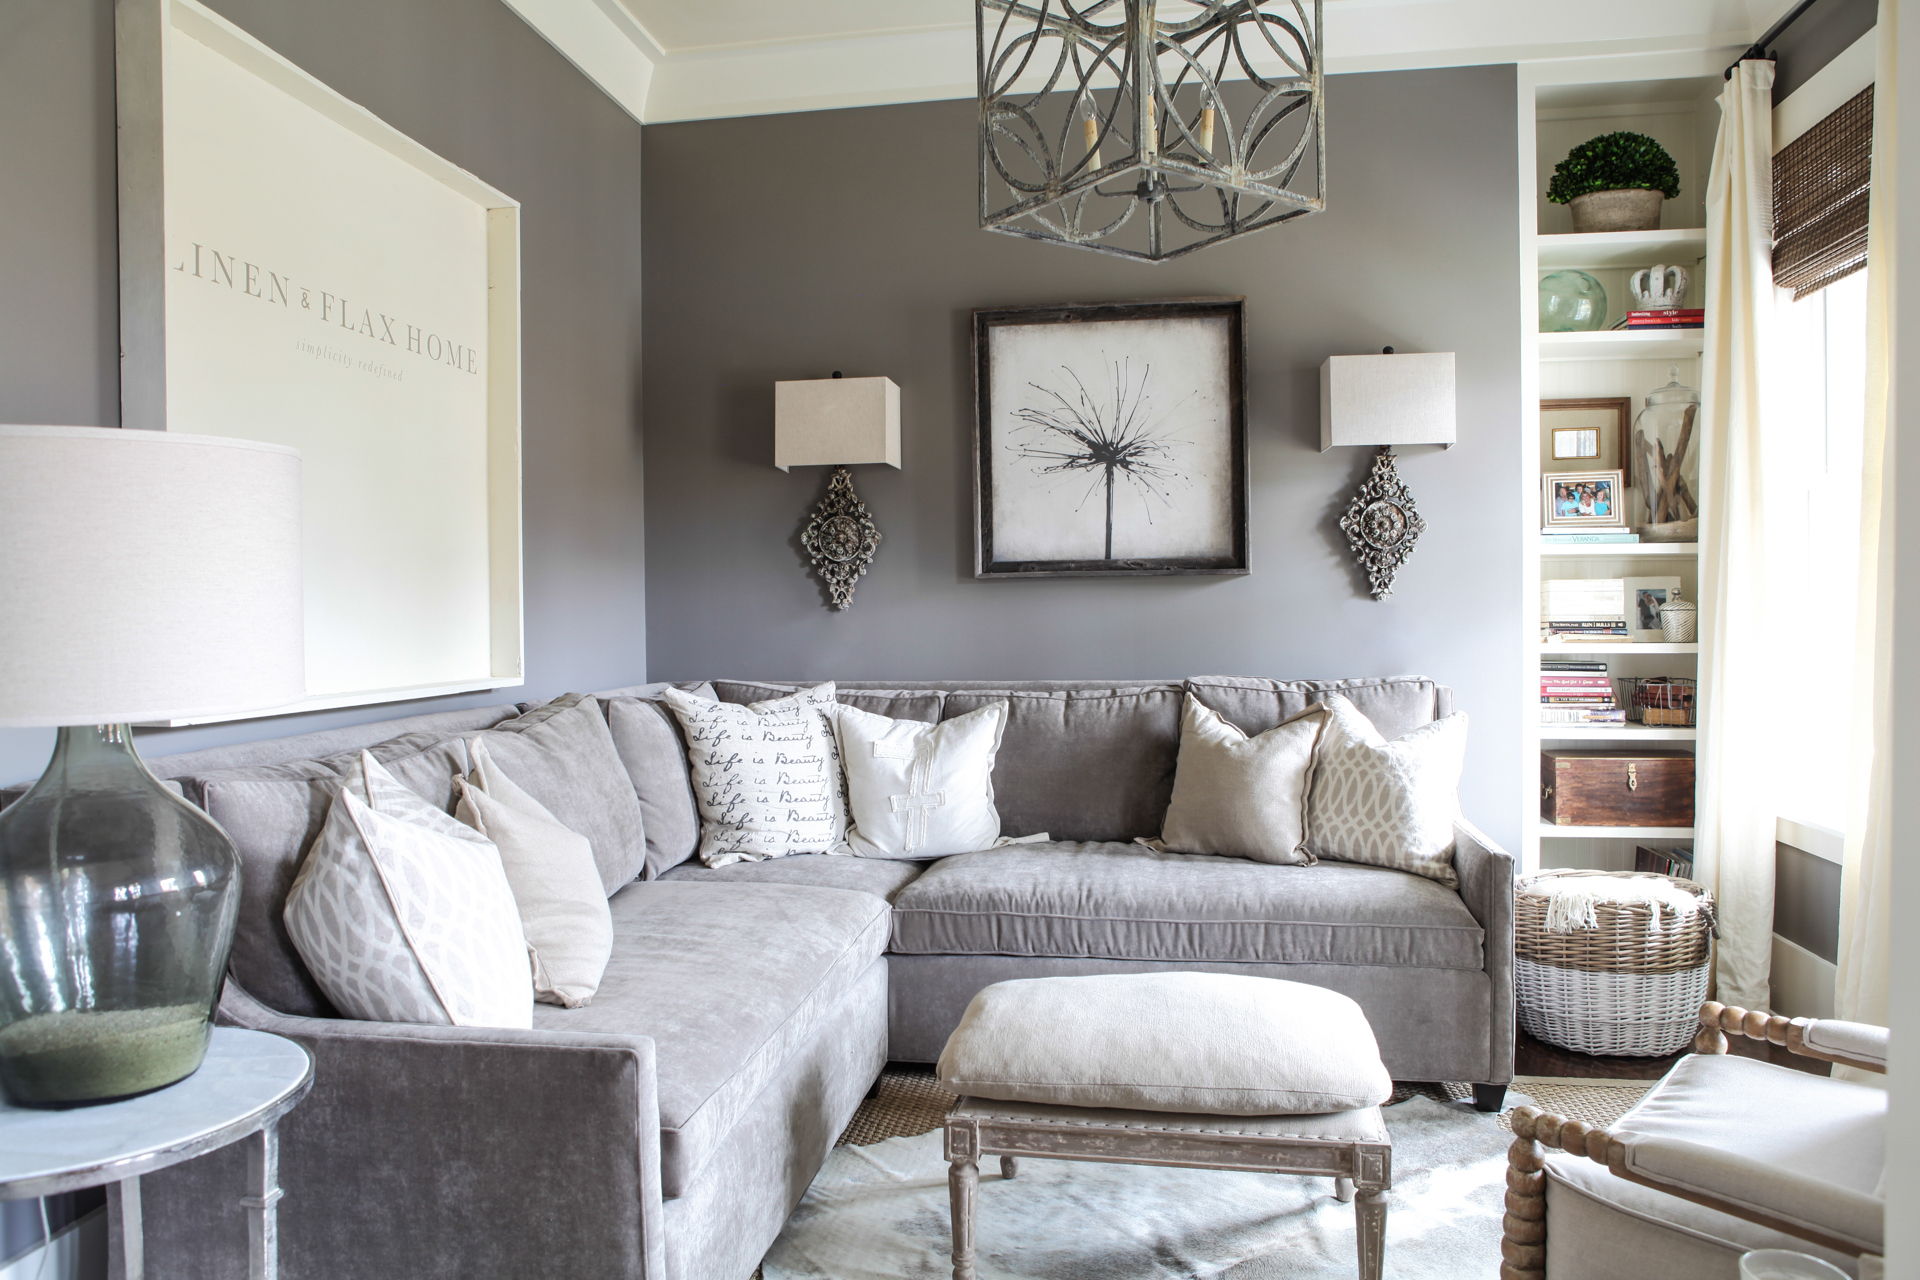 Awe Inspiring Linen Flax Home The Scoop On Sectional Sofas Inzonedesignstudio Interior Chair Design Inzonedesignstudiocom